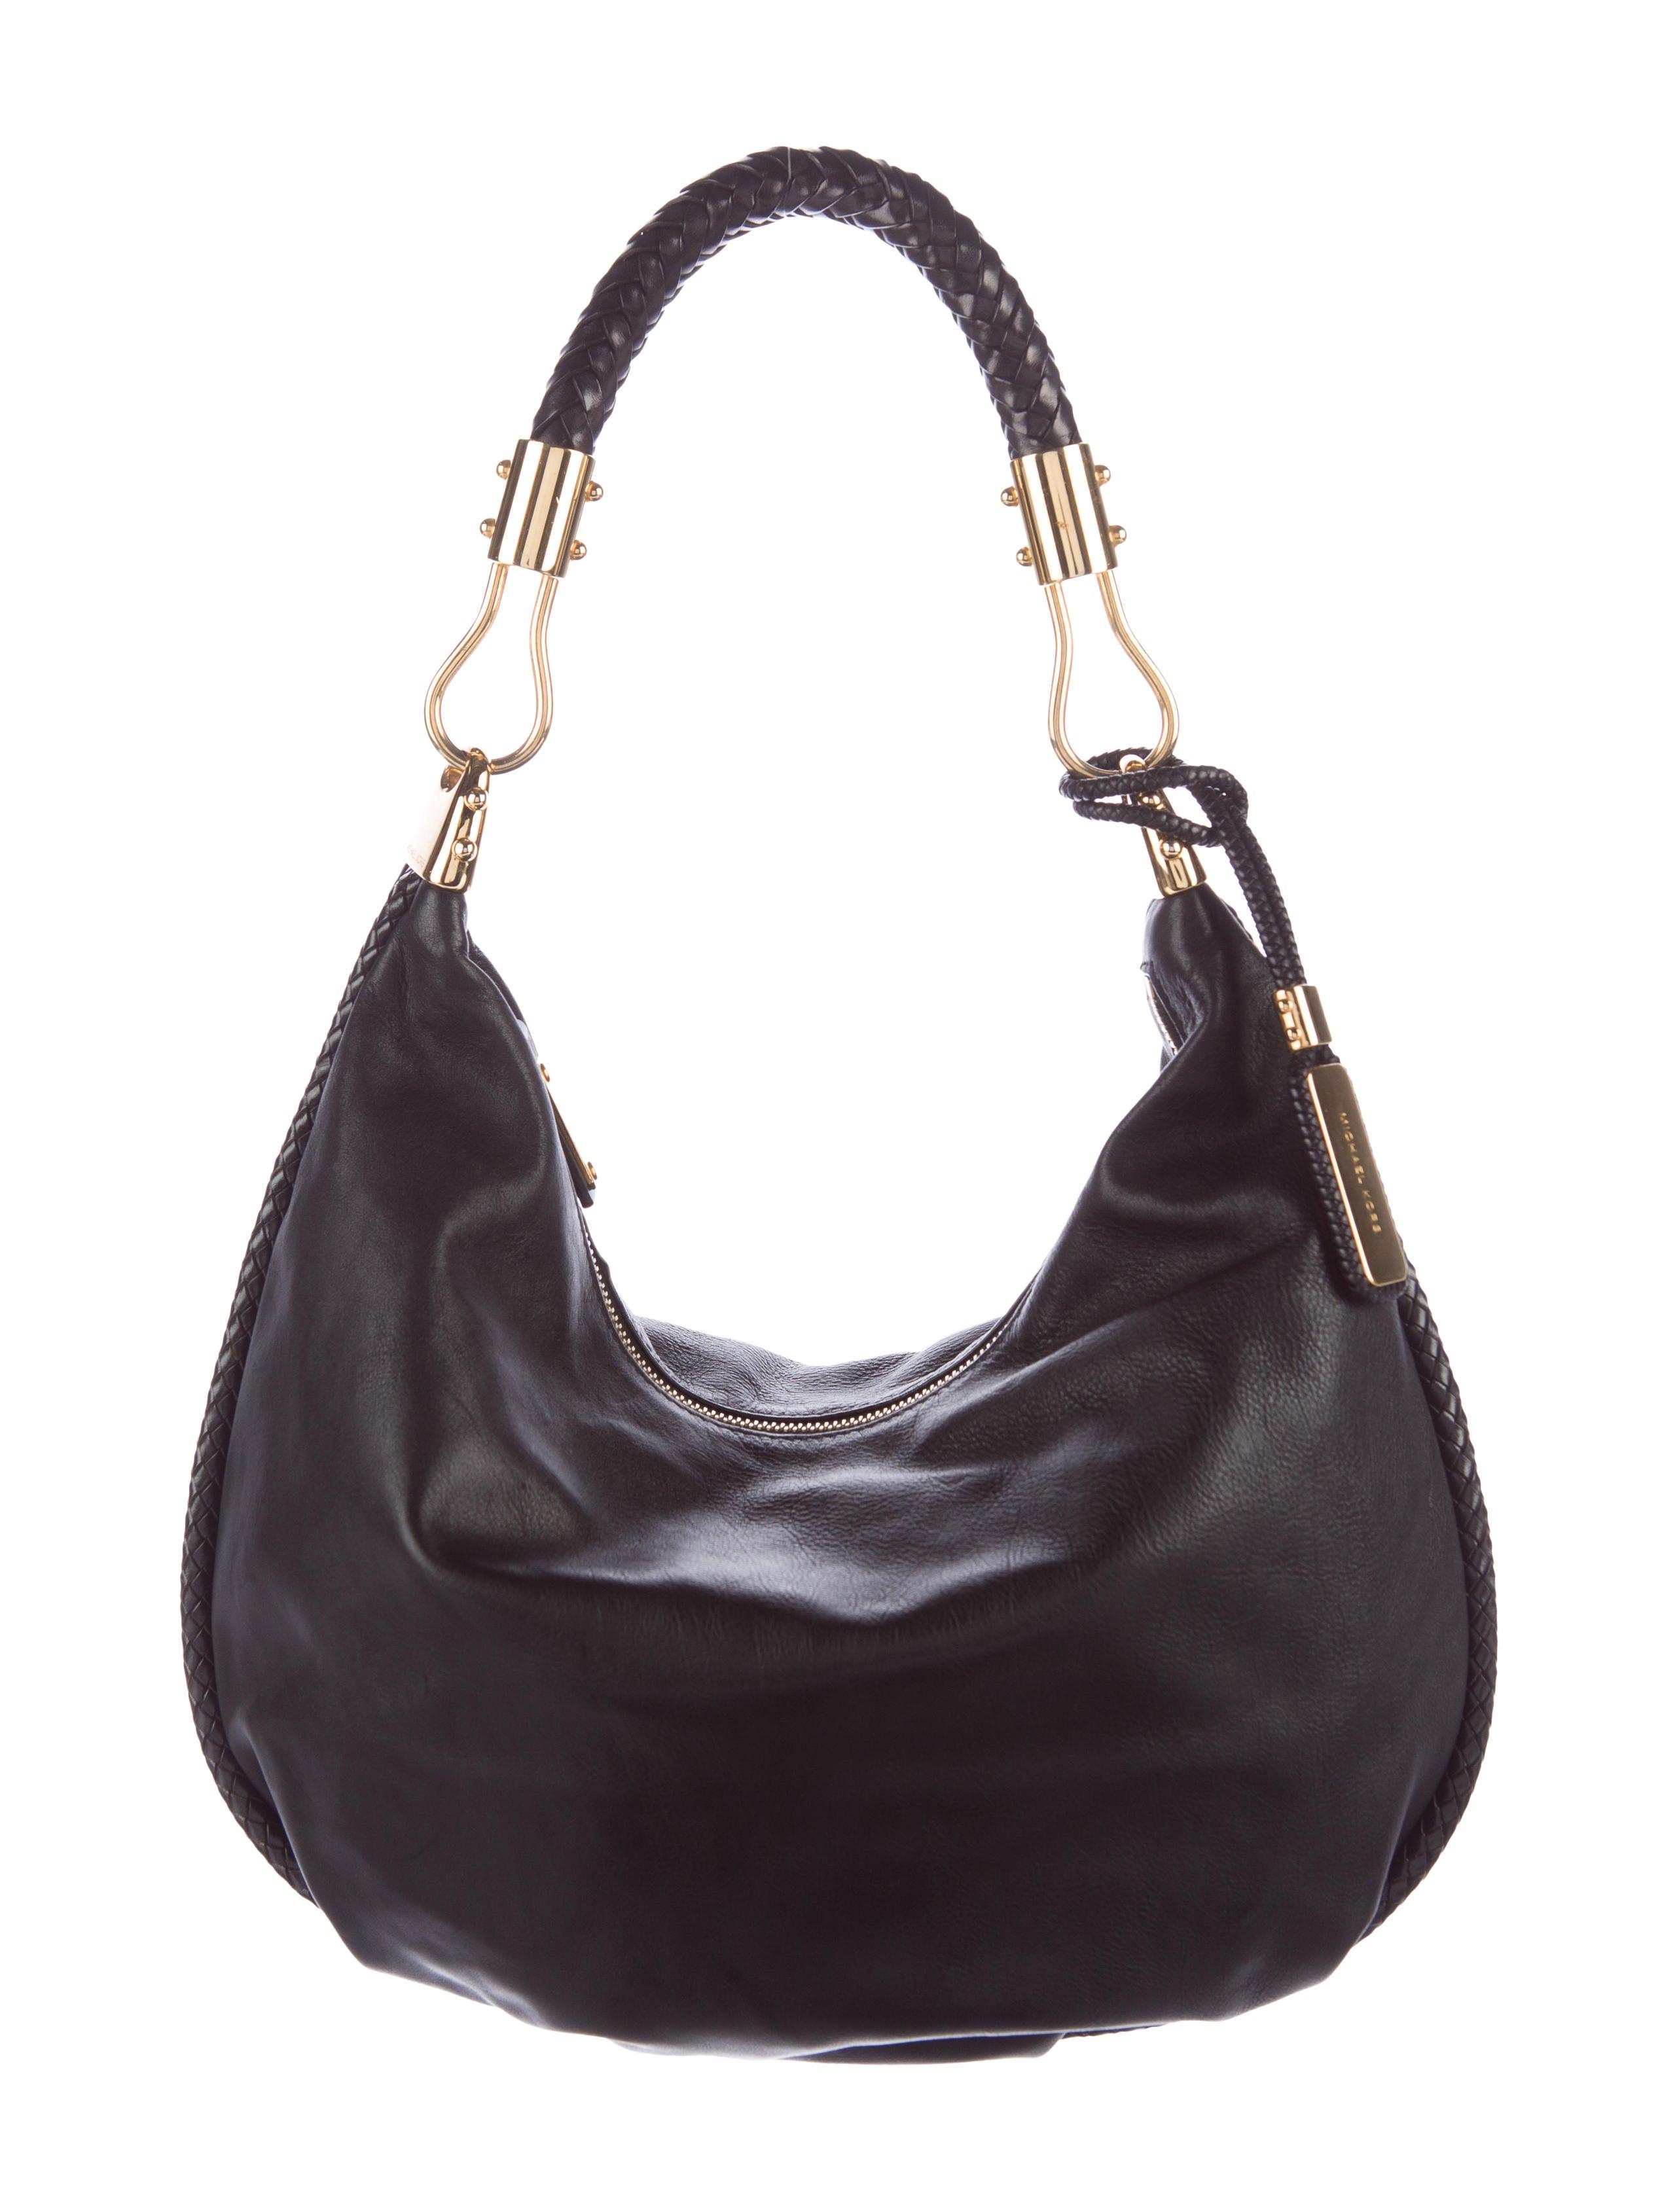 607f432615b6 Michael Kors Skorpios Leather Hobo - Handbags - MIC48403 | The RealReal